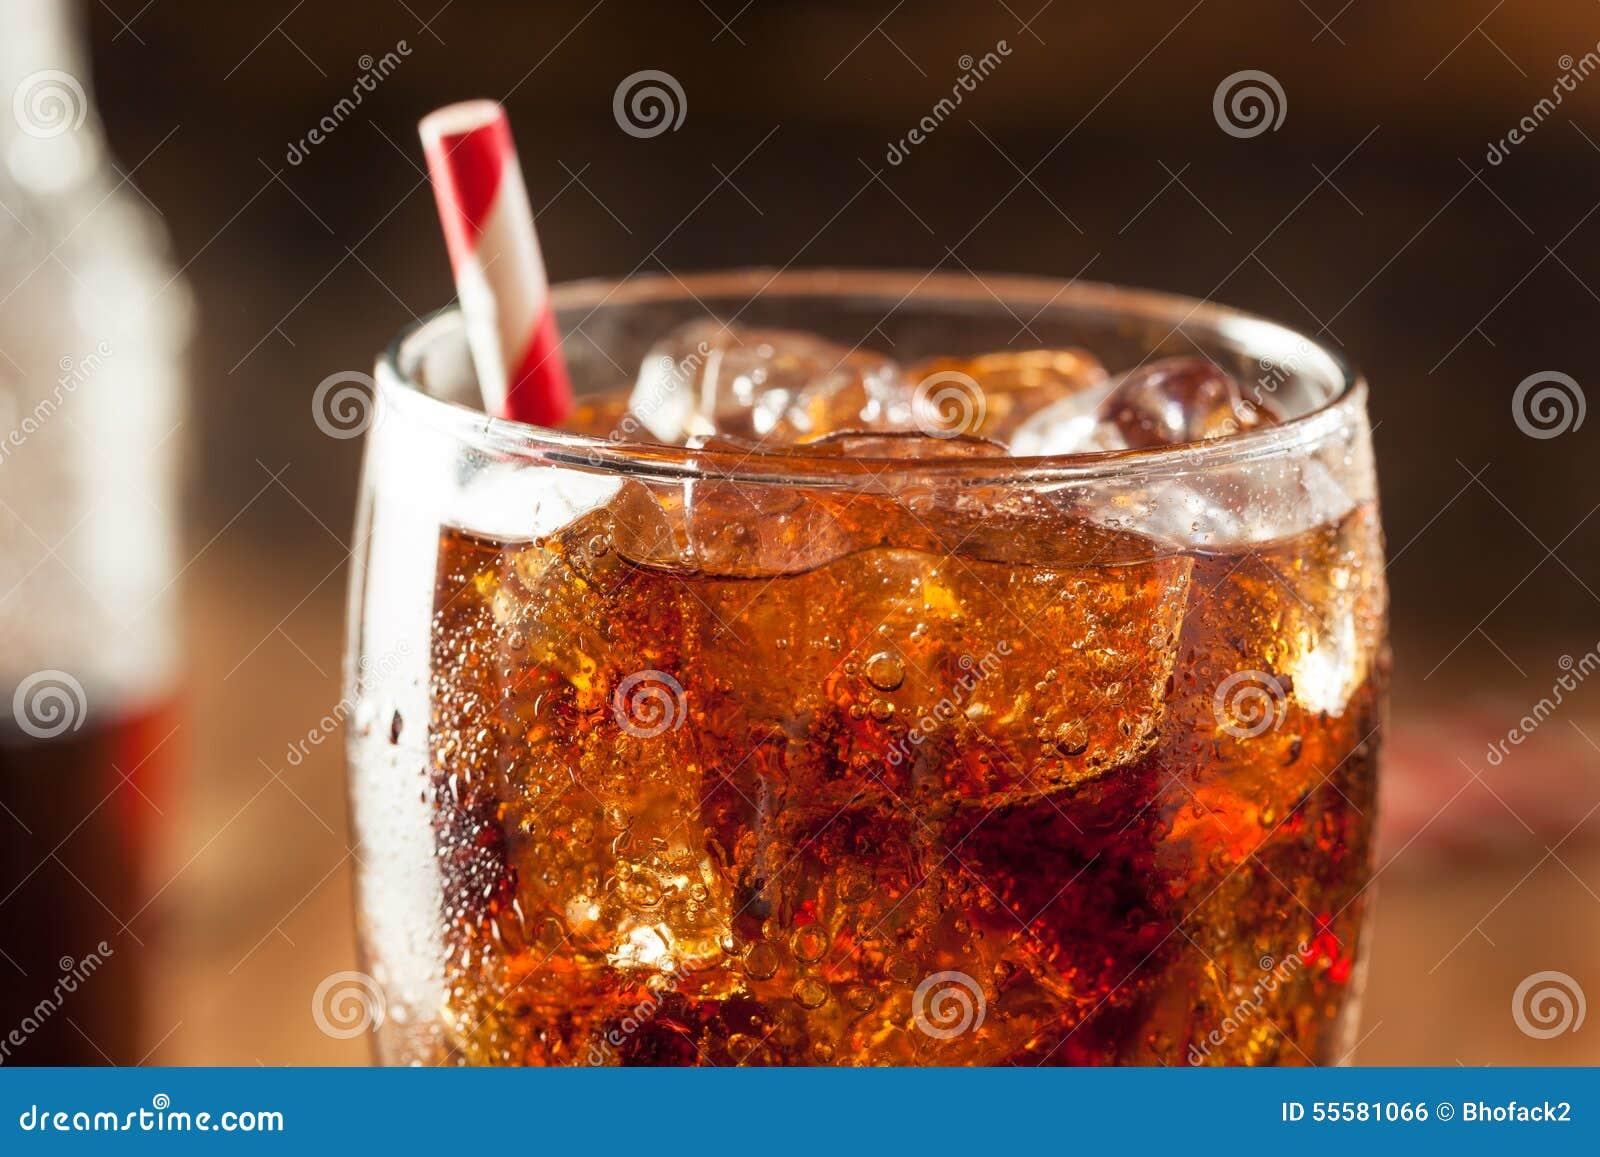 PNF de soda borbulhante de refrescamento